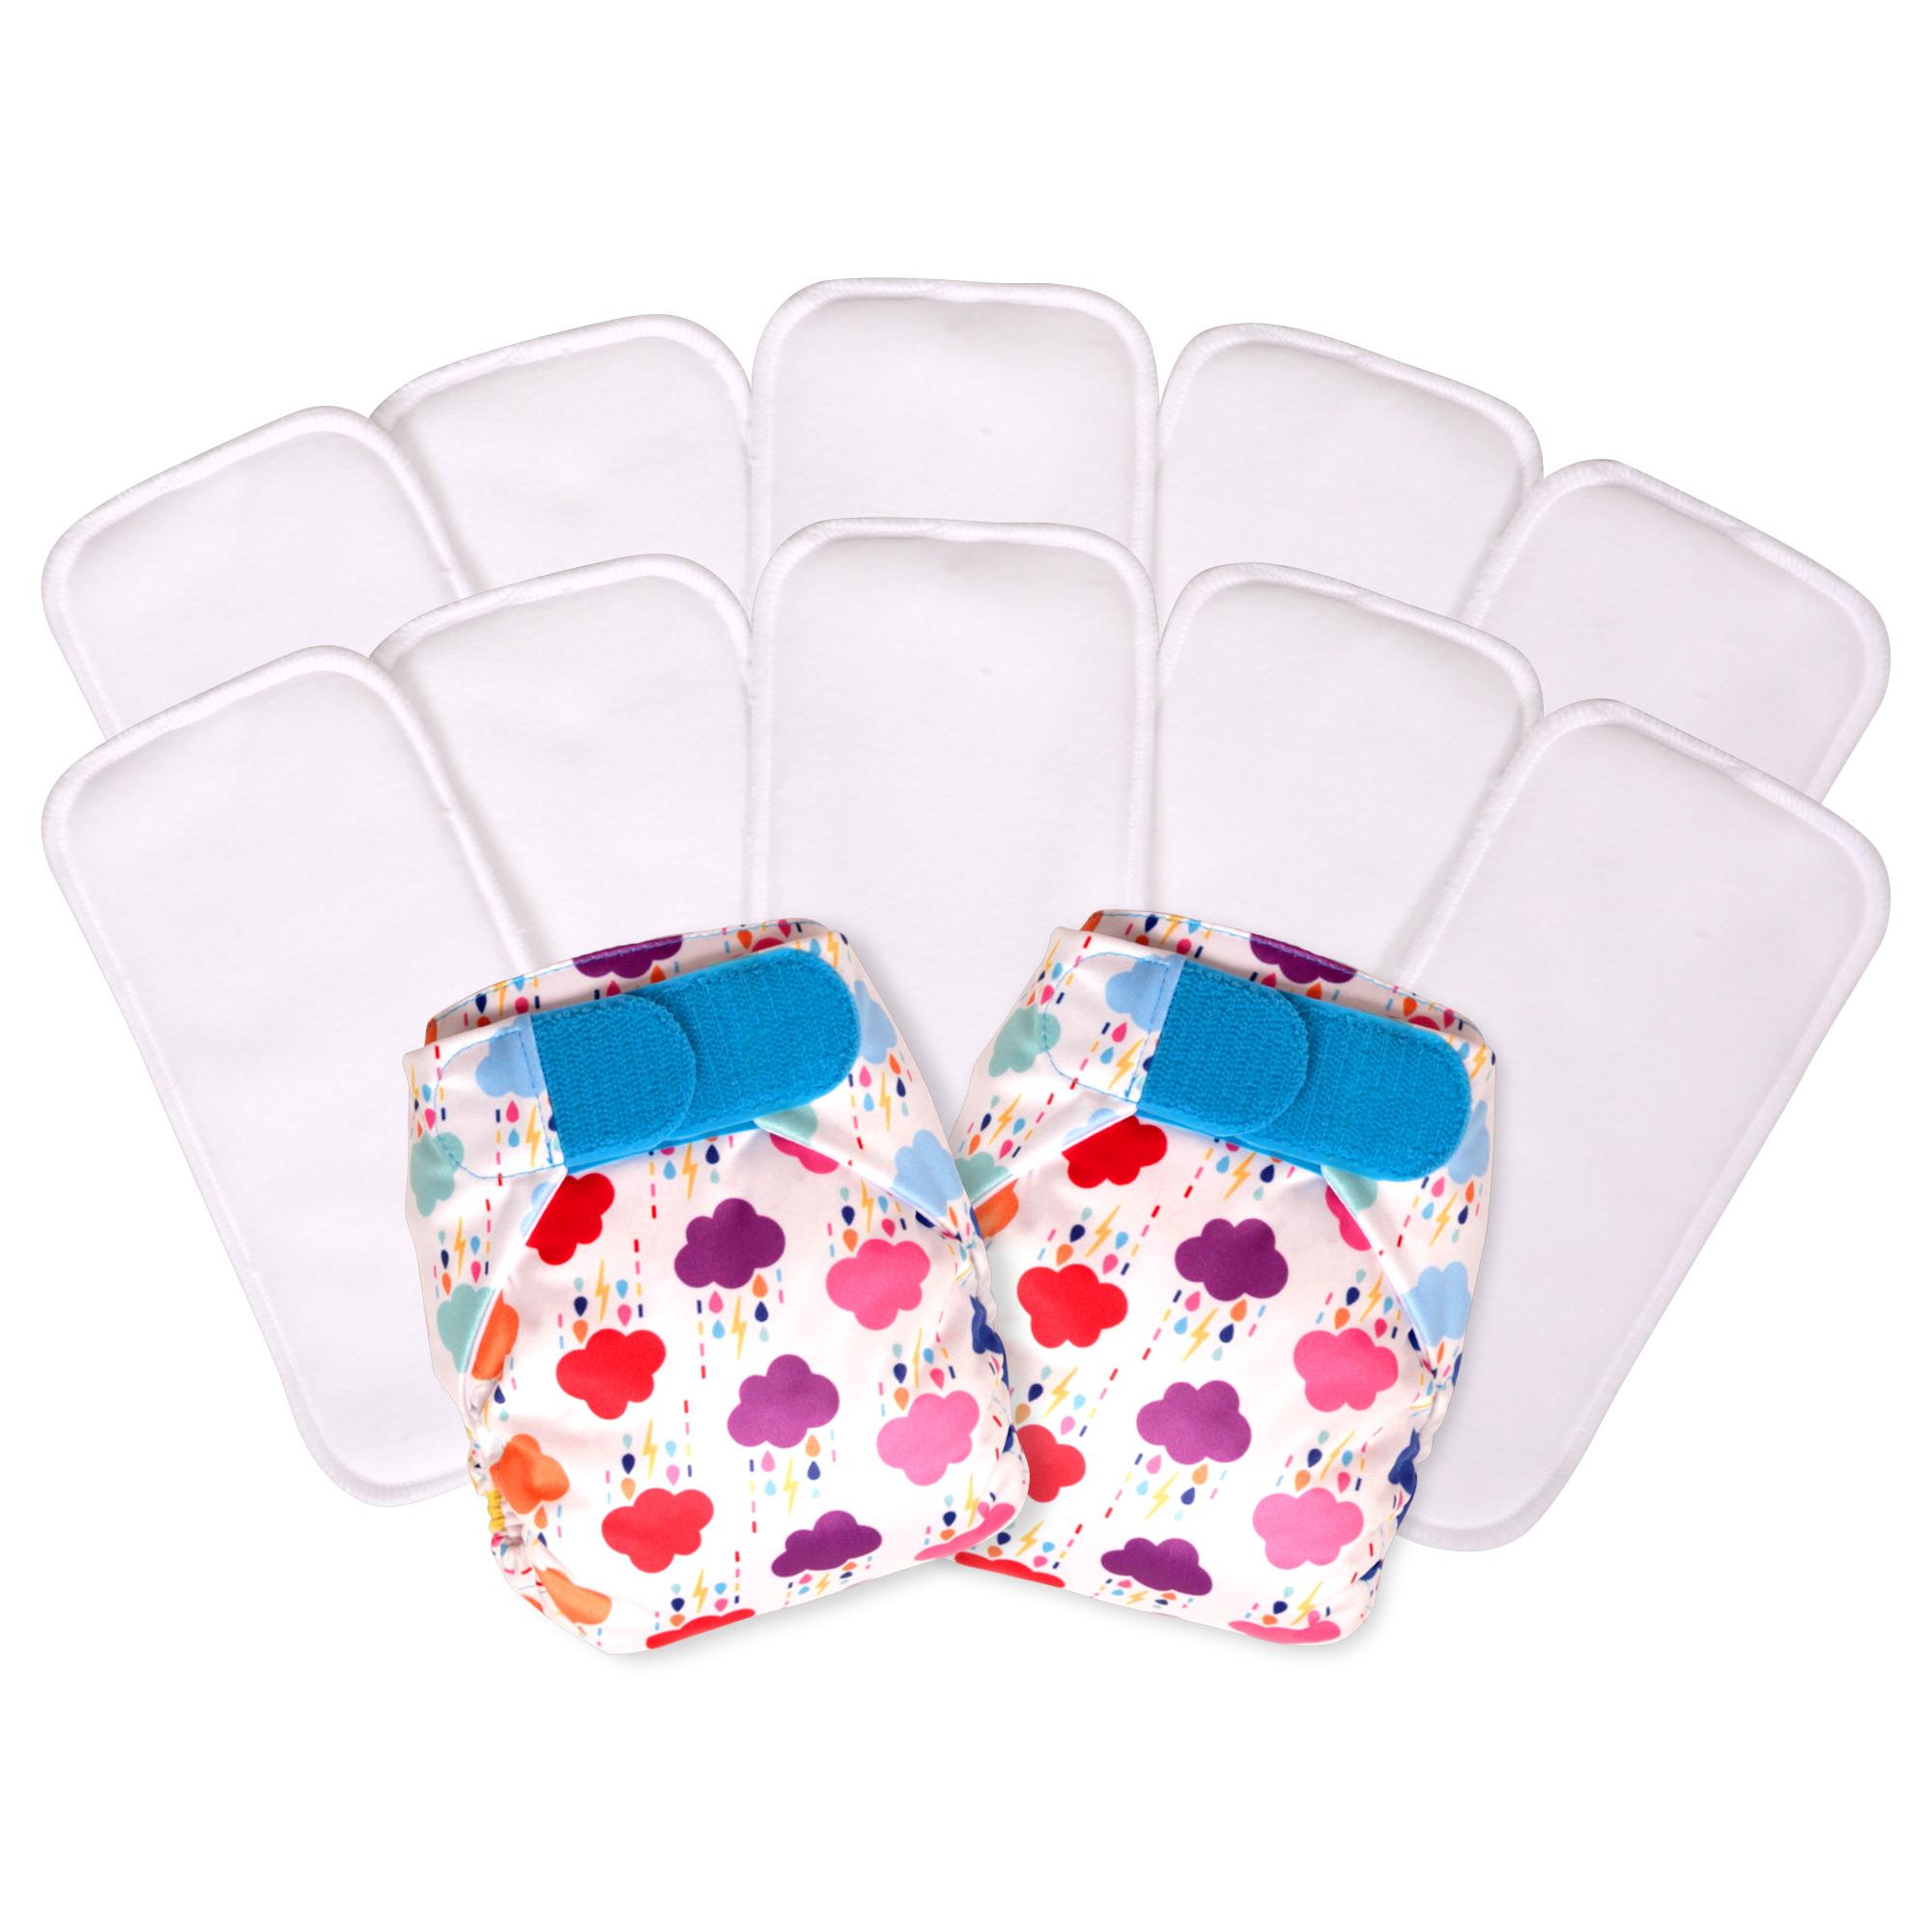 10 pack newborn kit